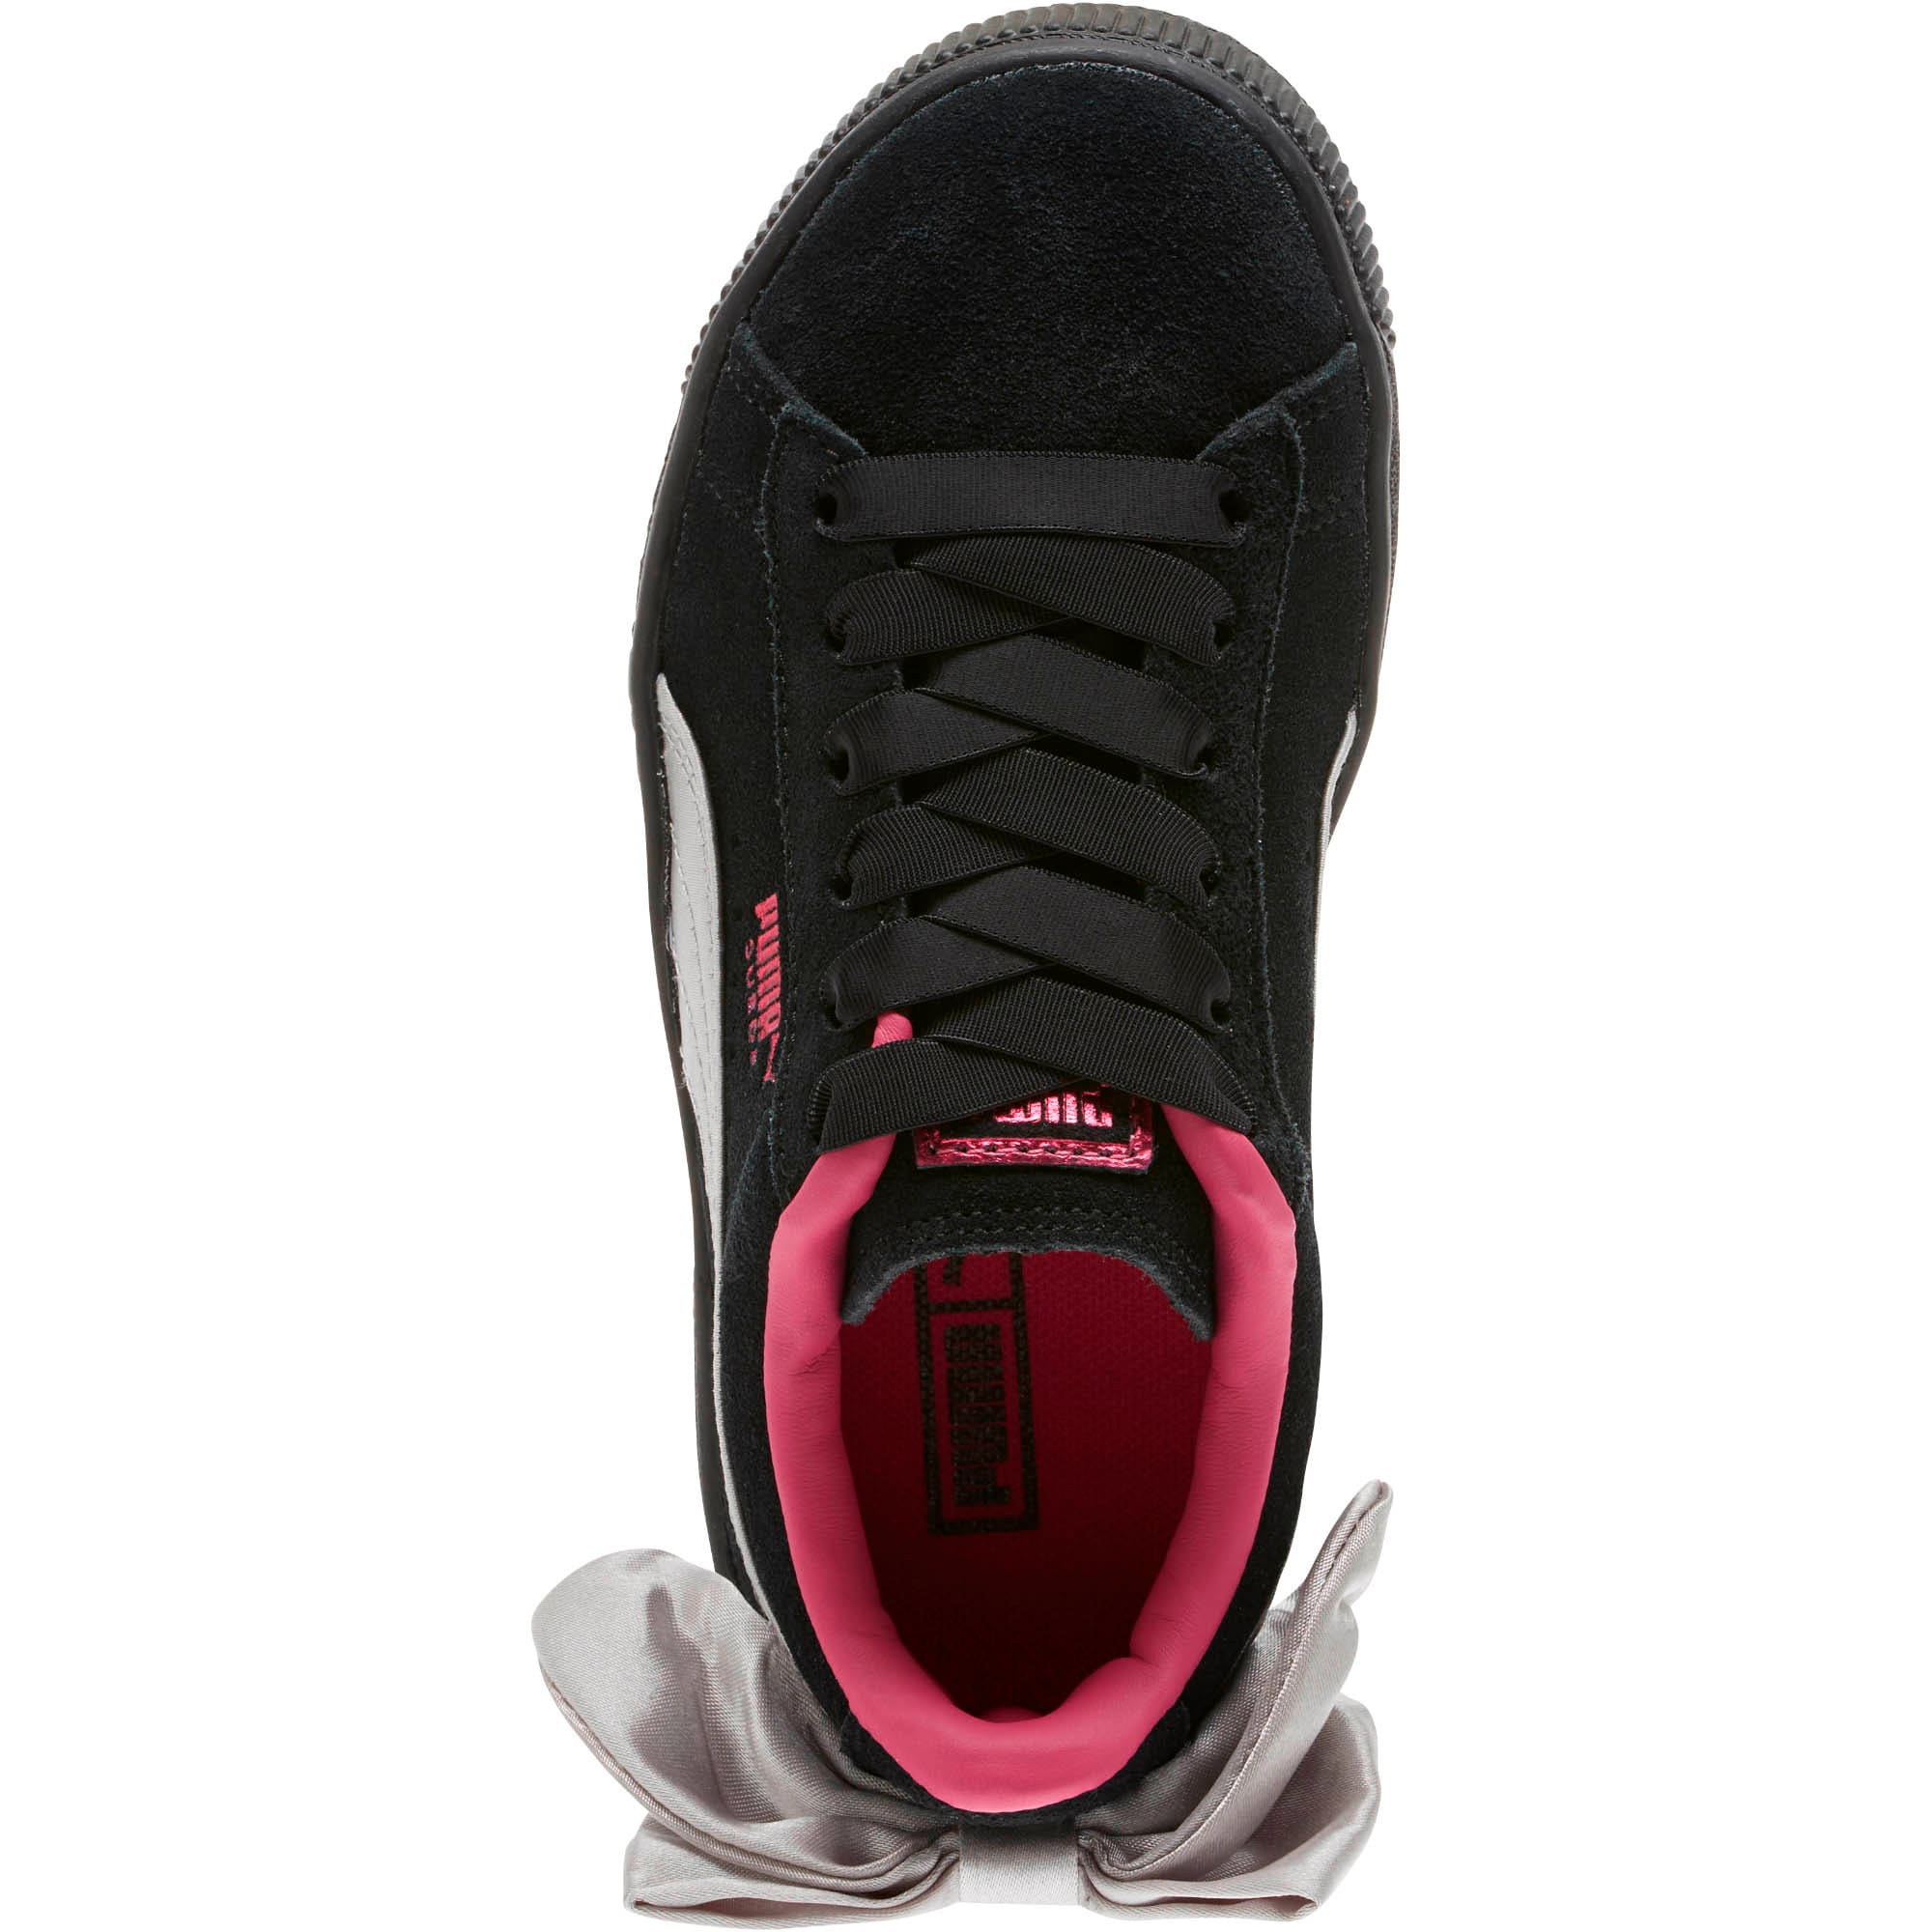 Thumbnail 5 of Suede Bow AC Little Kids' Shoes, Puma Black-Fuchsia Purple, medium